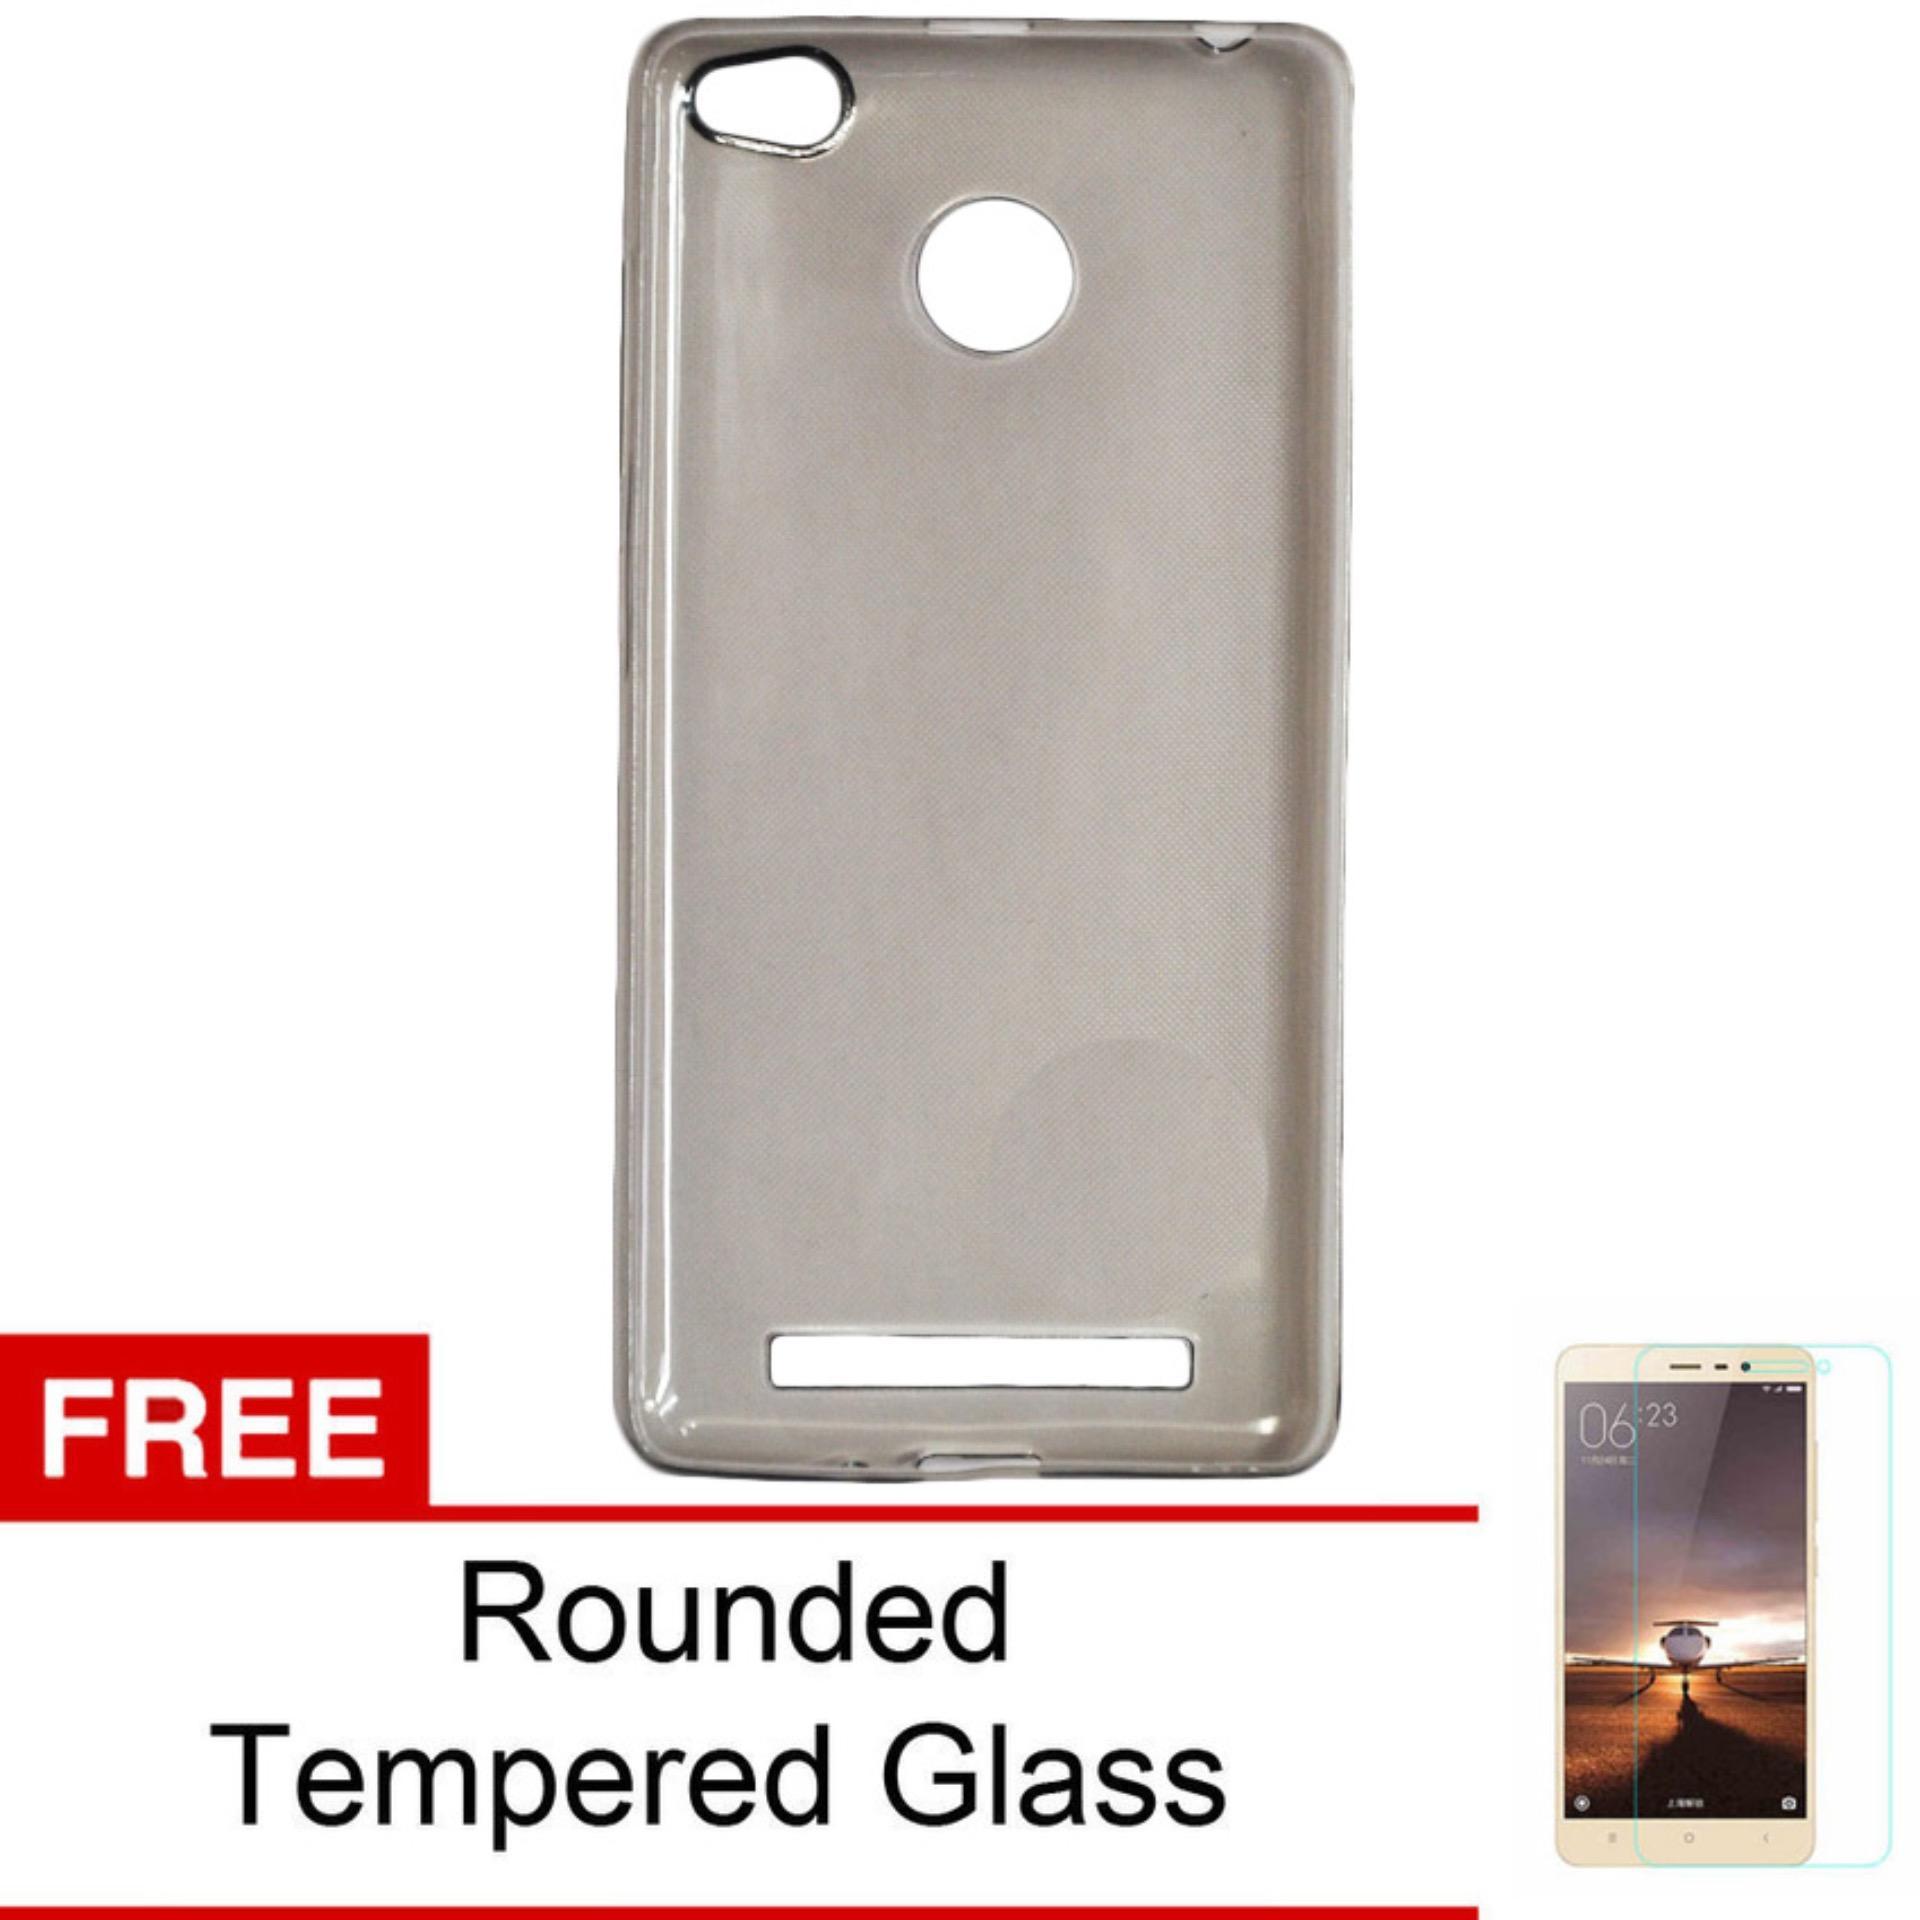 ... CLEAR FREE TEMPERED GLASS. Discount Case For Xiaomi Redmi 3S / Redmi 3 Pro Ultrahin Air Case Series - Abu